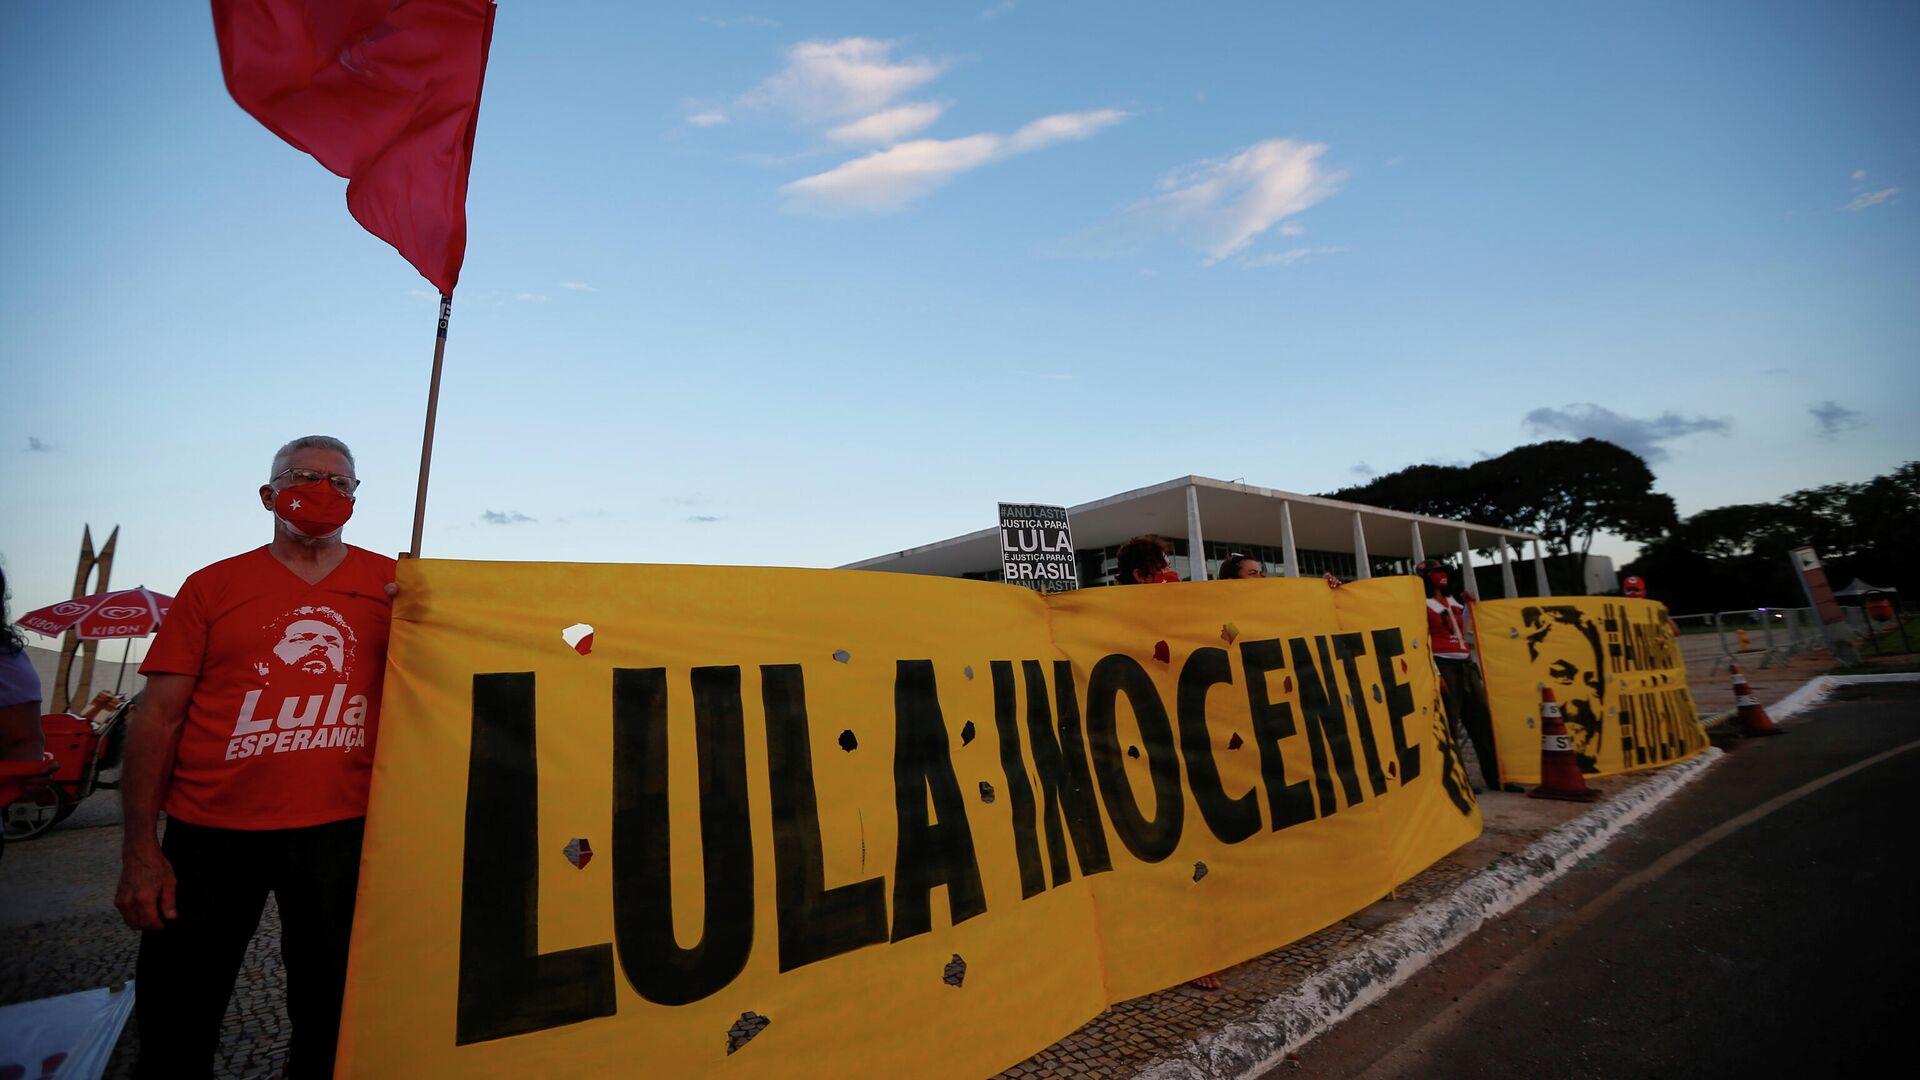 Simpatizantes del expresidente brasileño Luiz Inácio Lula da Silva - Sputnik Mundo, 1920, 16.04.2021